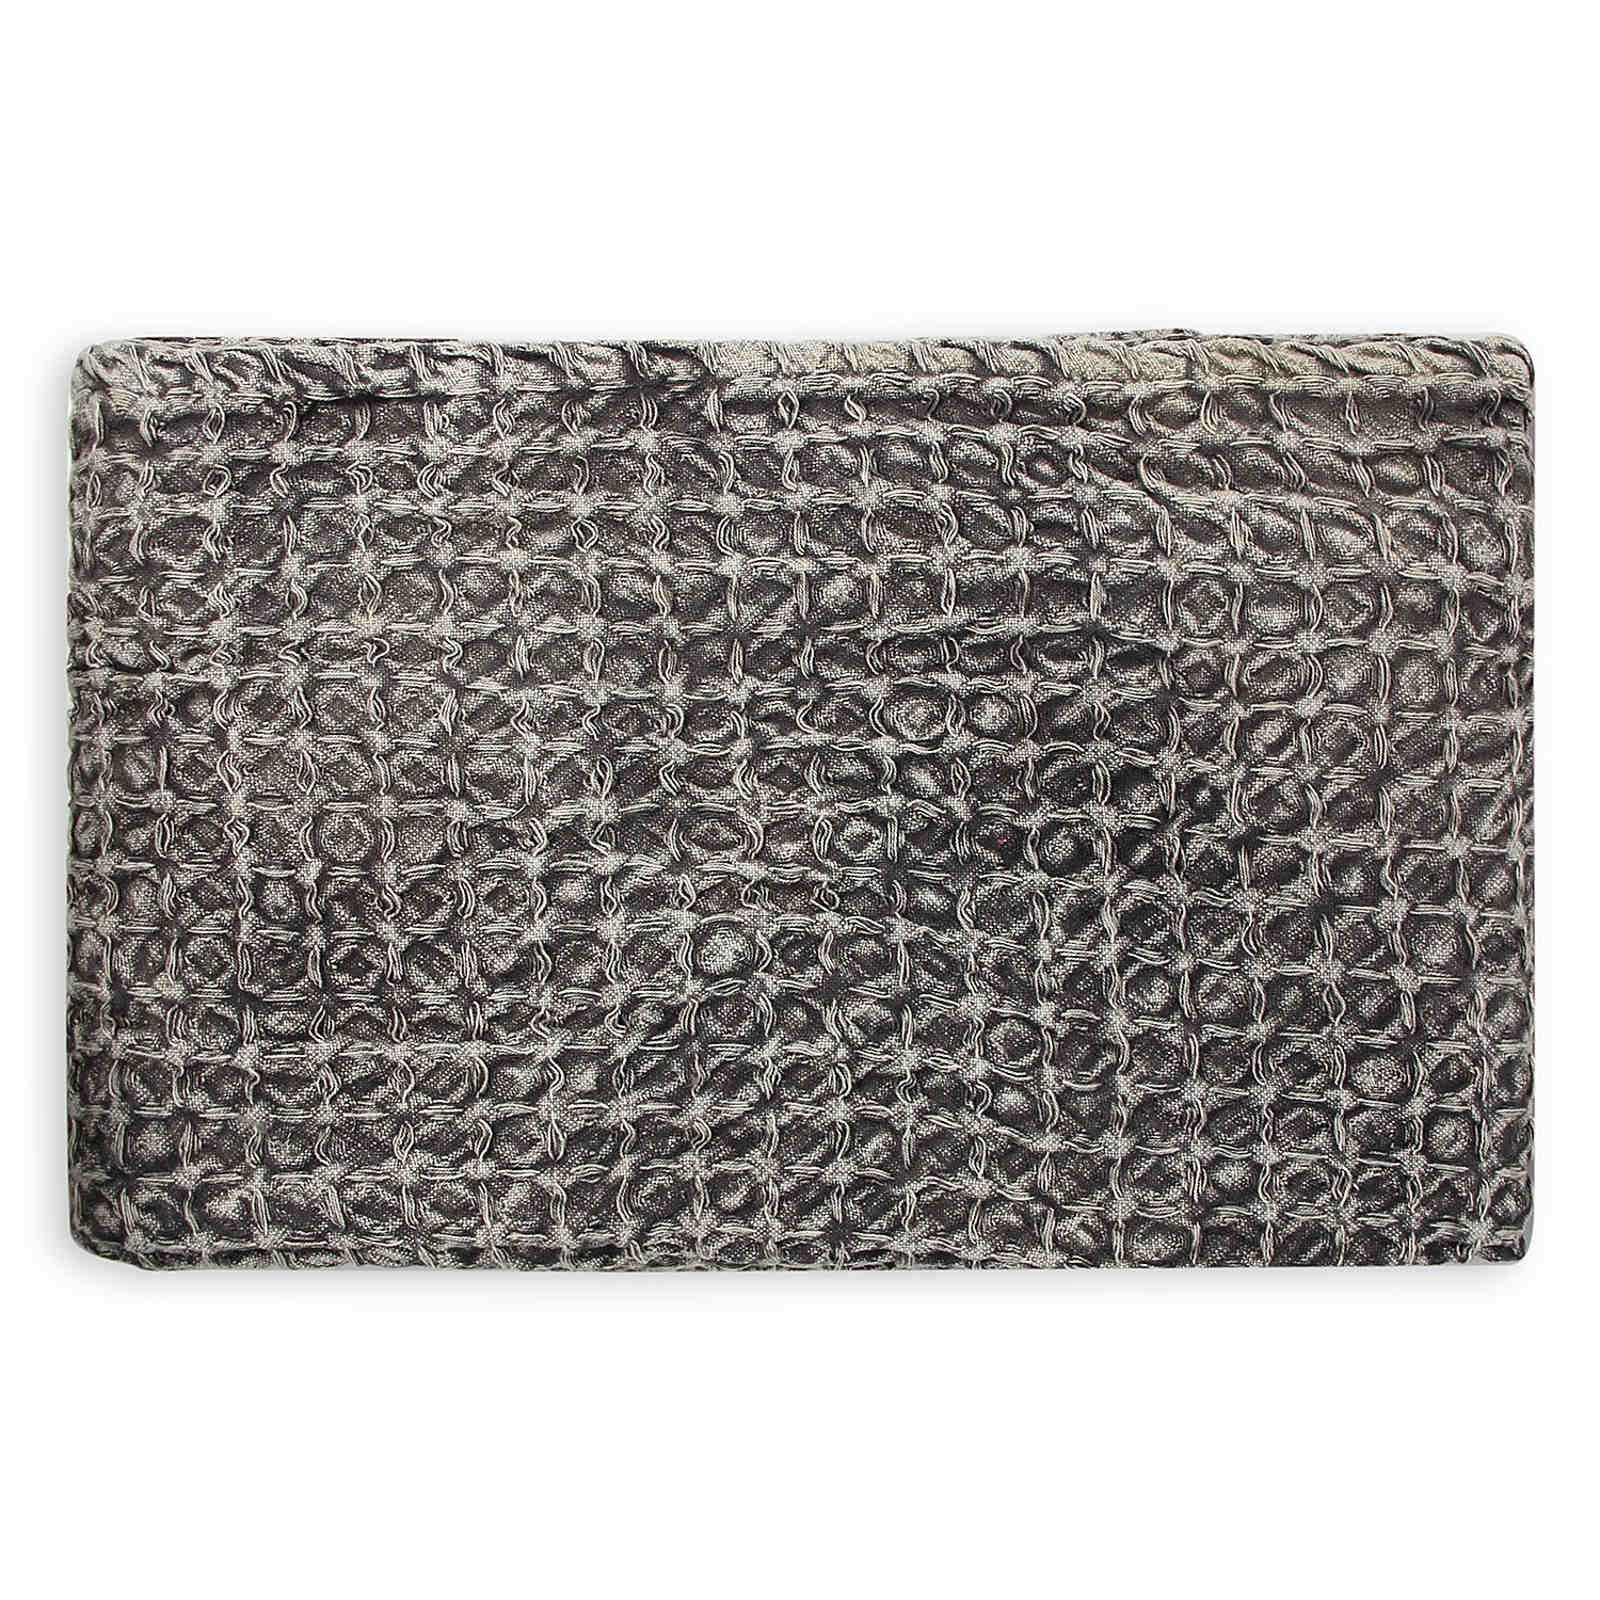 Oregon-Stonewash-Waffle-Throw-Modern-Distressed-Sofa-Bed-Blankets-100-Cotton thumbnail 13